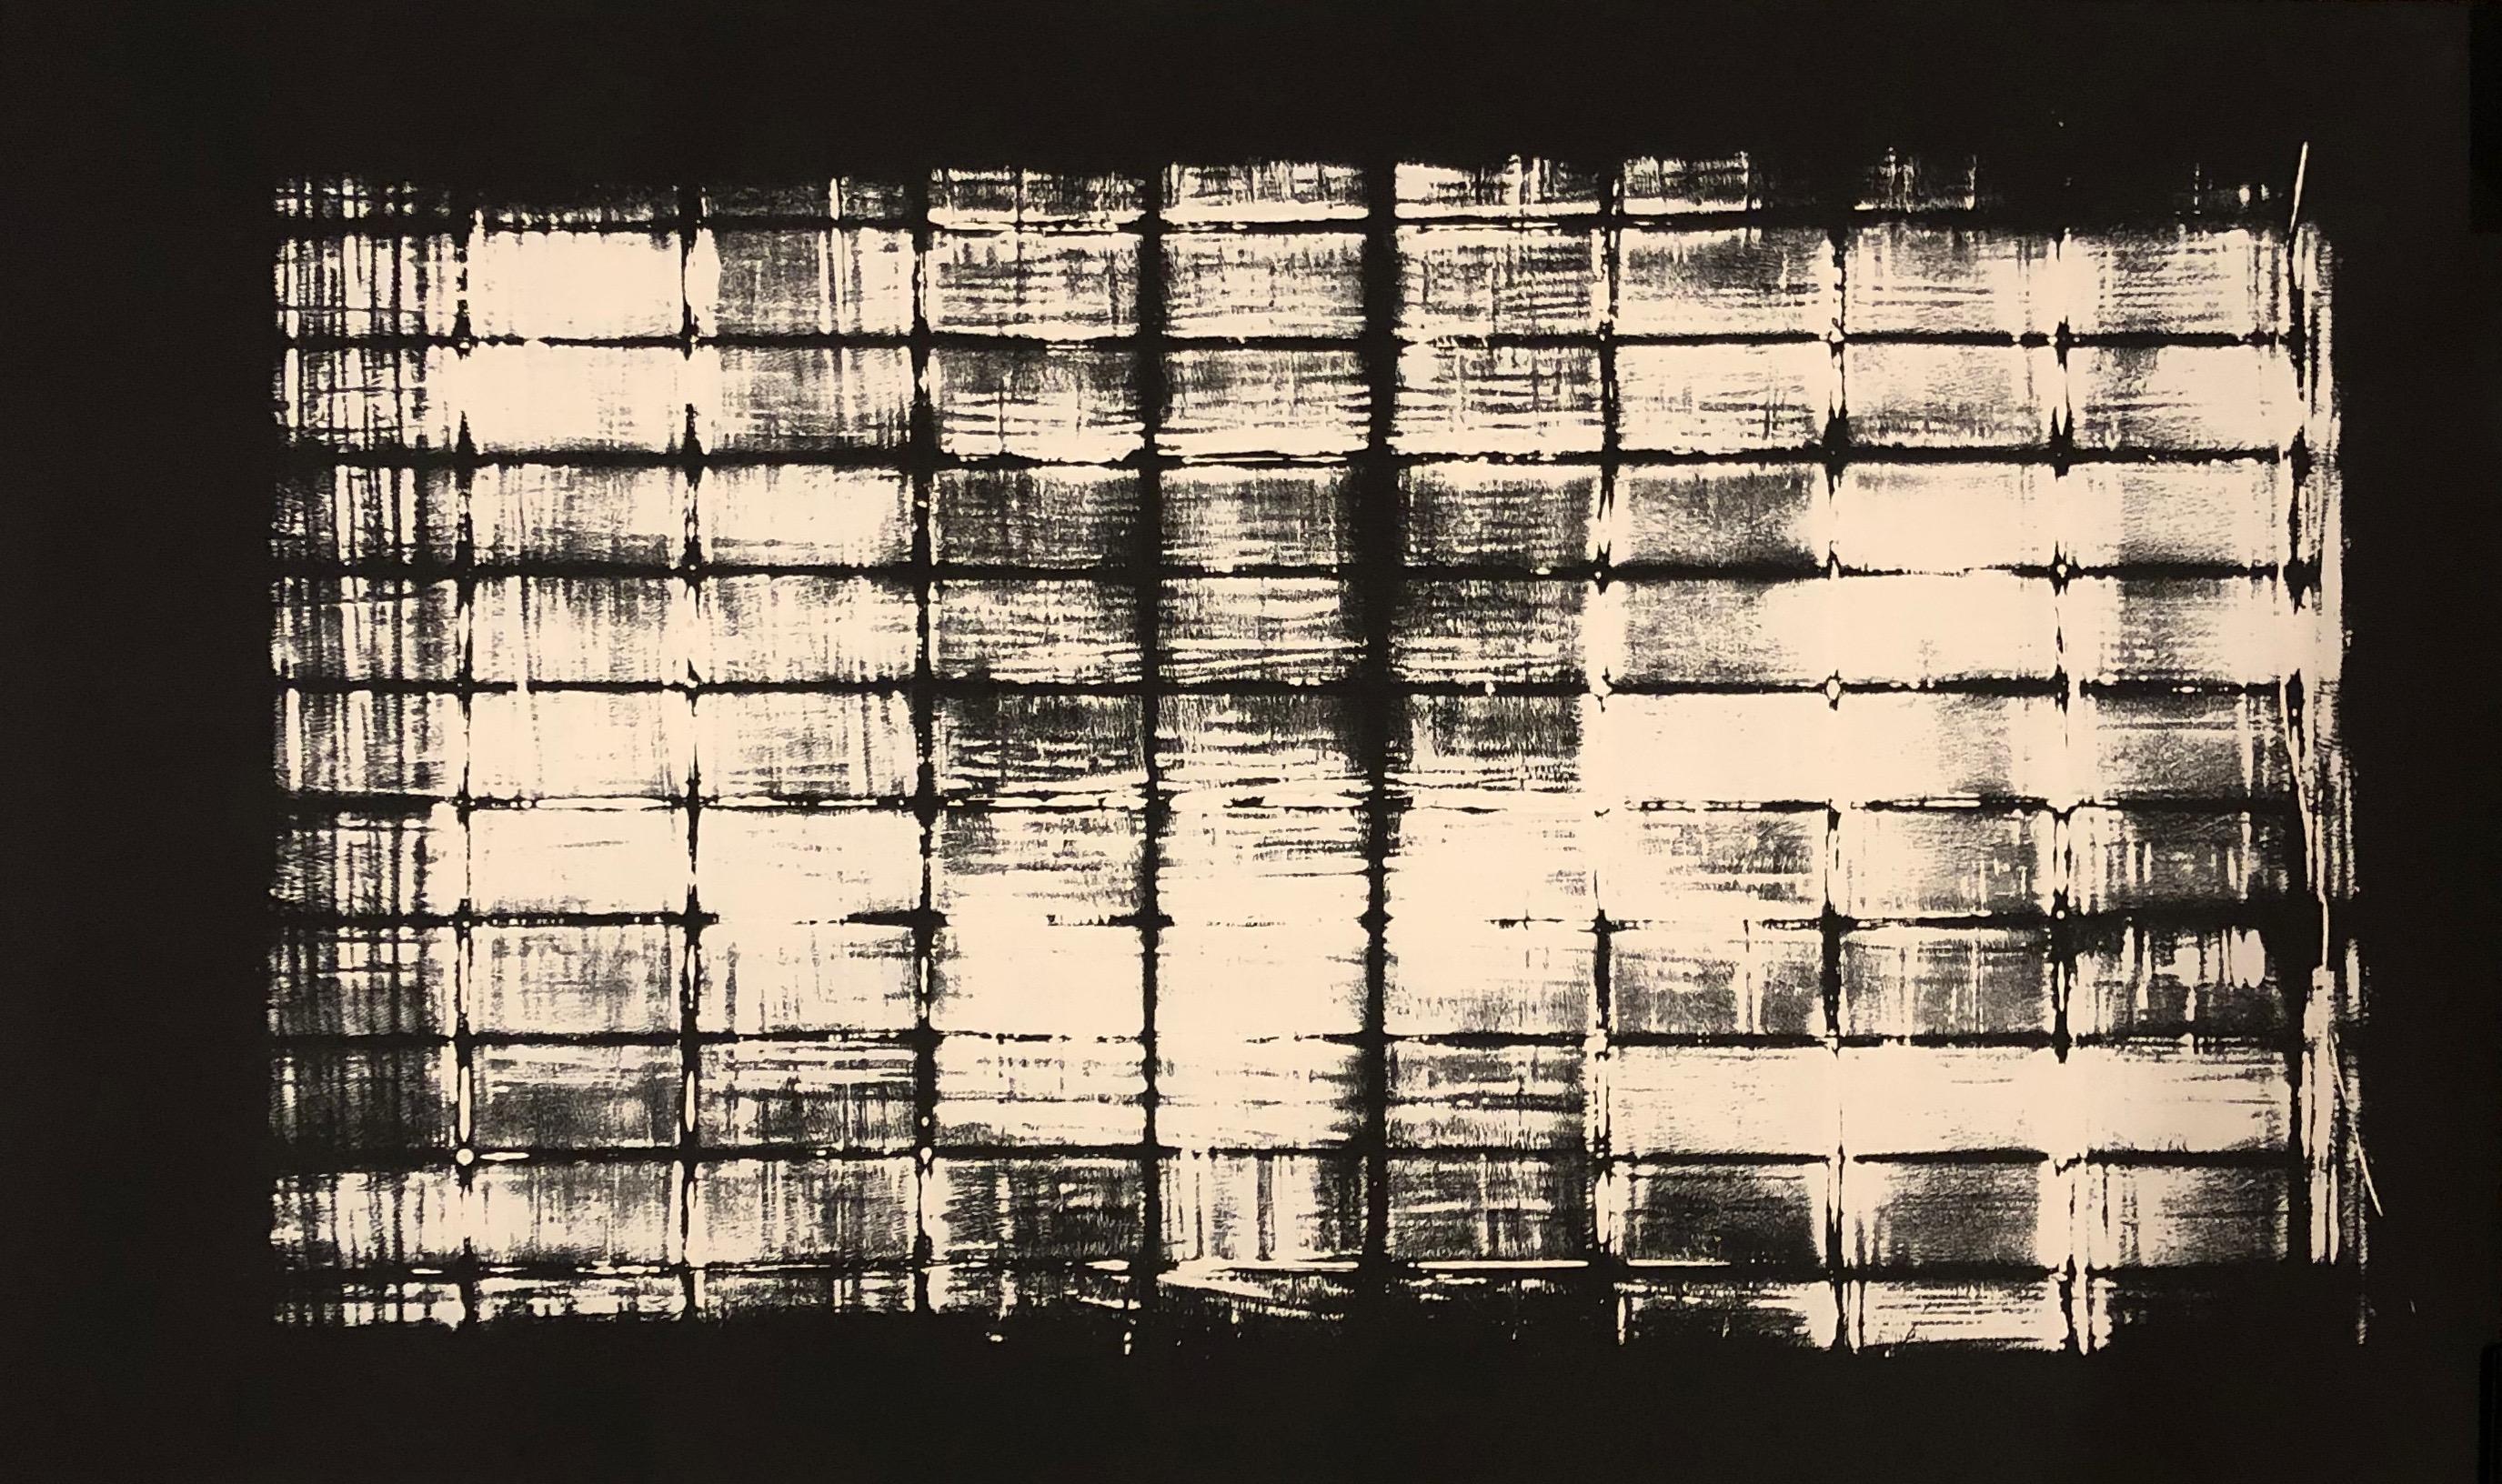 Number 2 artwork by Stephen Vassilakos - art listed for sale on Artplode